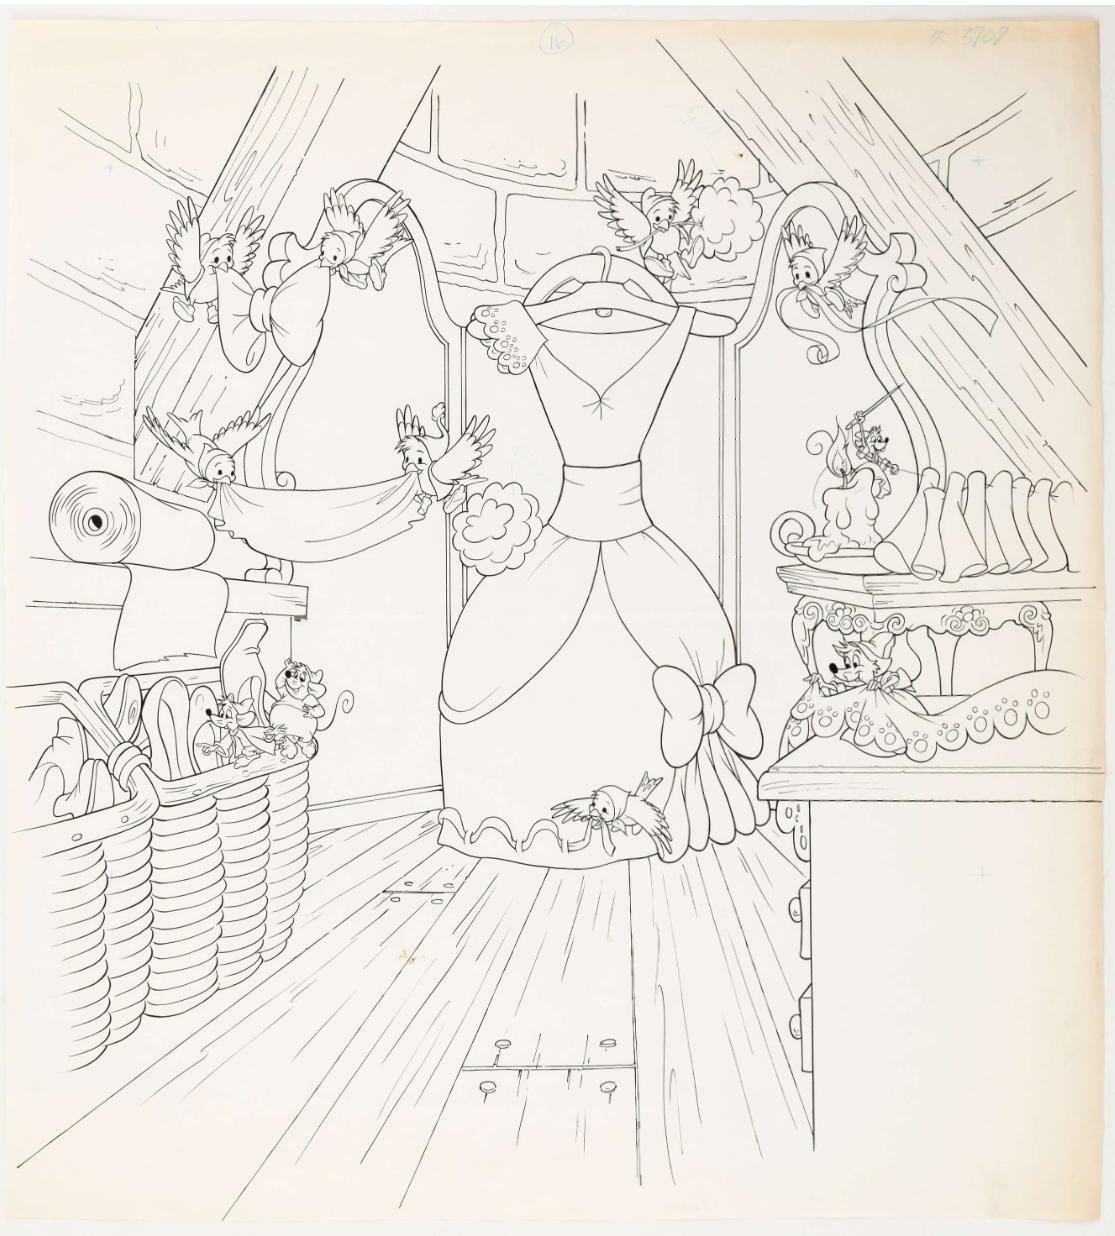 Cinderella : Gus and Jaq Dress-Making Illustration (Walt Disney, c